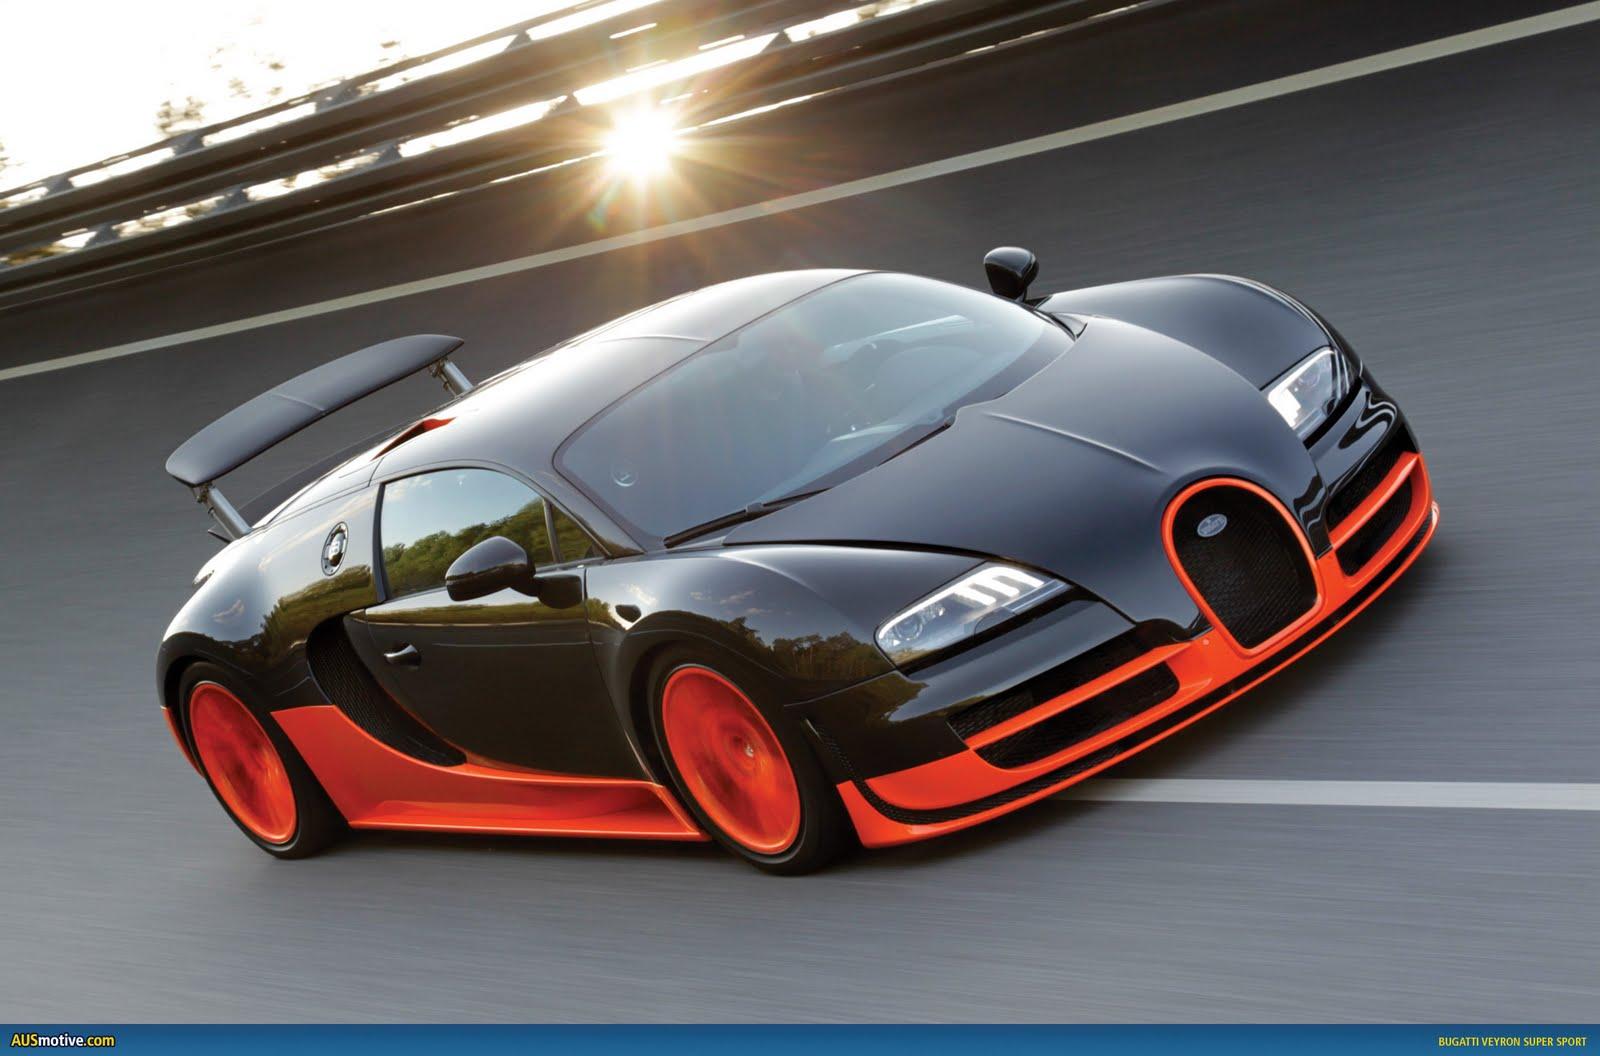 https://1.bp.blogspot.com/-PIWEXGfs-2w/Tfg3sGL0EGI/AAAAAAAABf4/5wB8Lr_DeDk/s1600/Bugatti-Veyron-Super-Sport-01.jpg